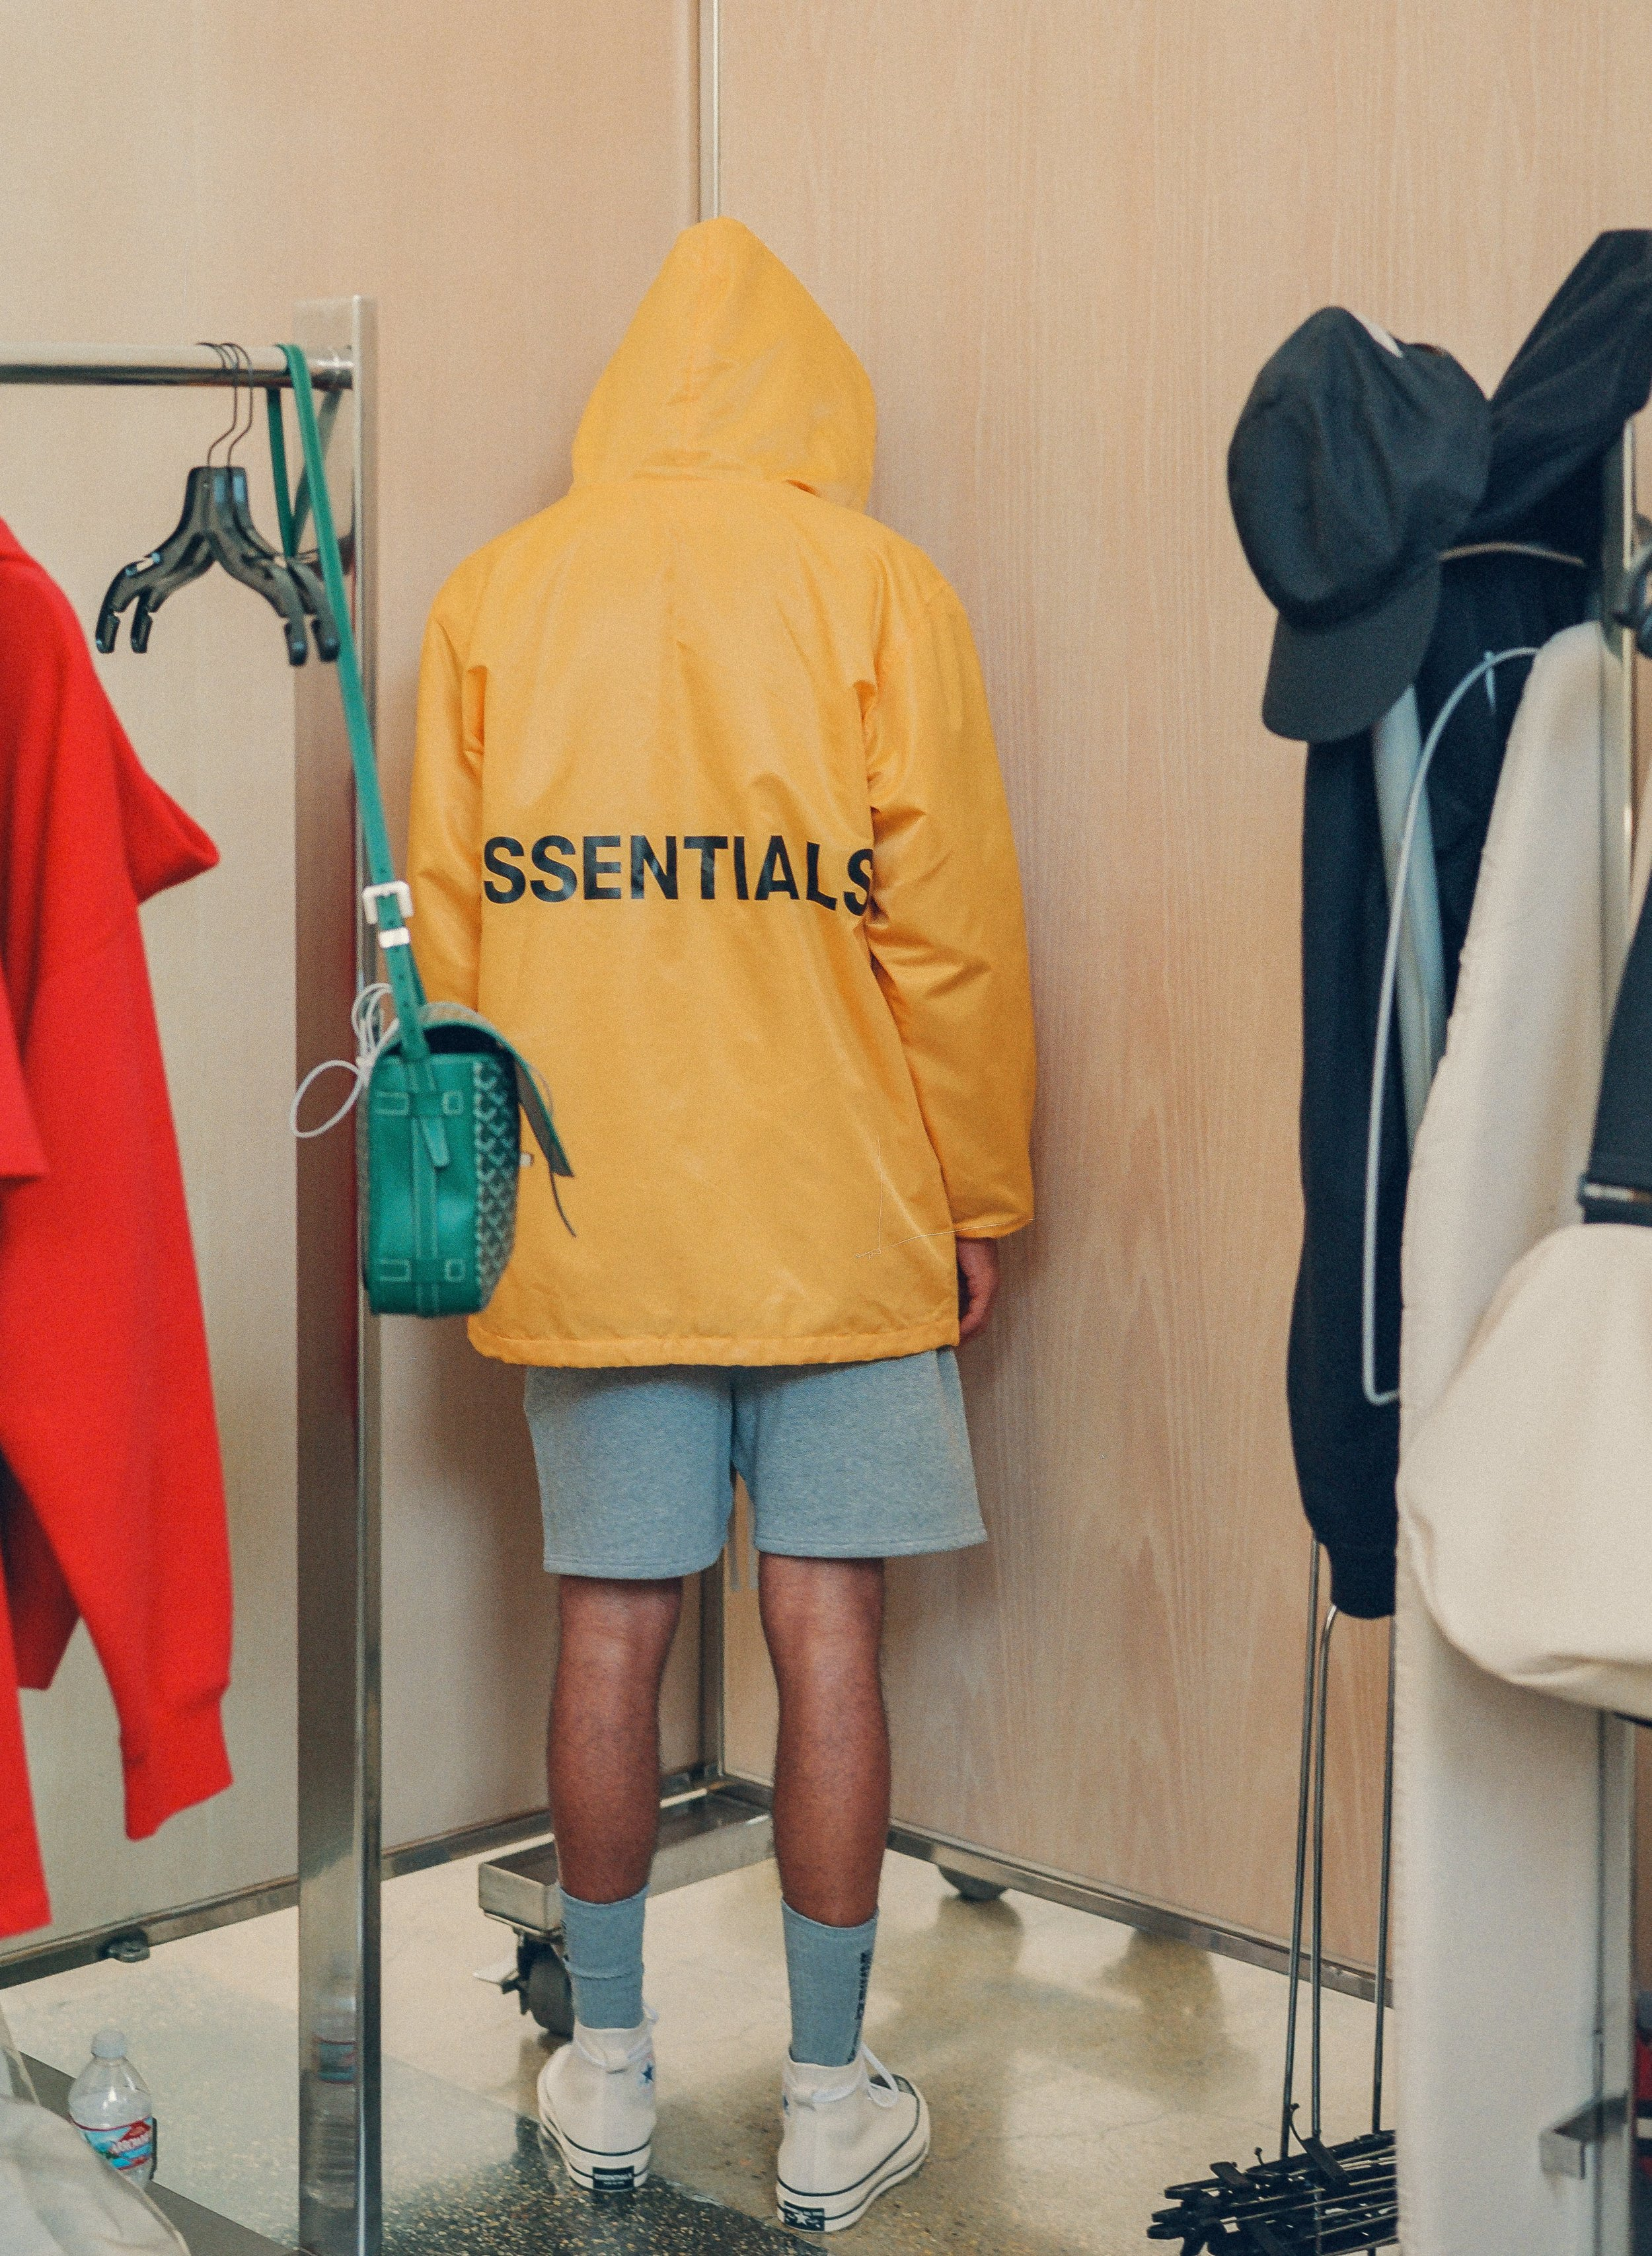 Essentials by Jerry Lorenzo